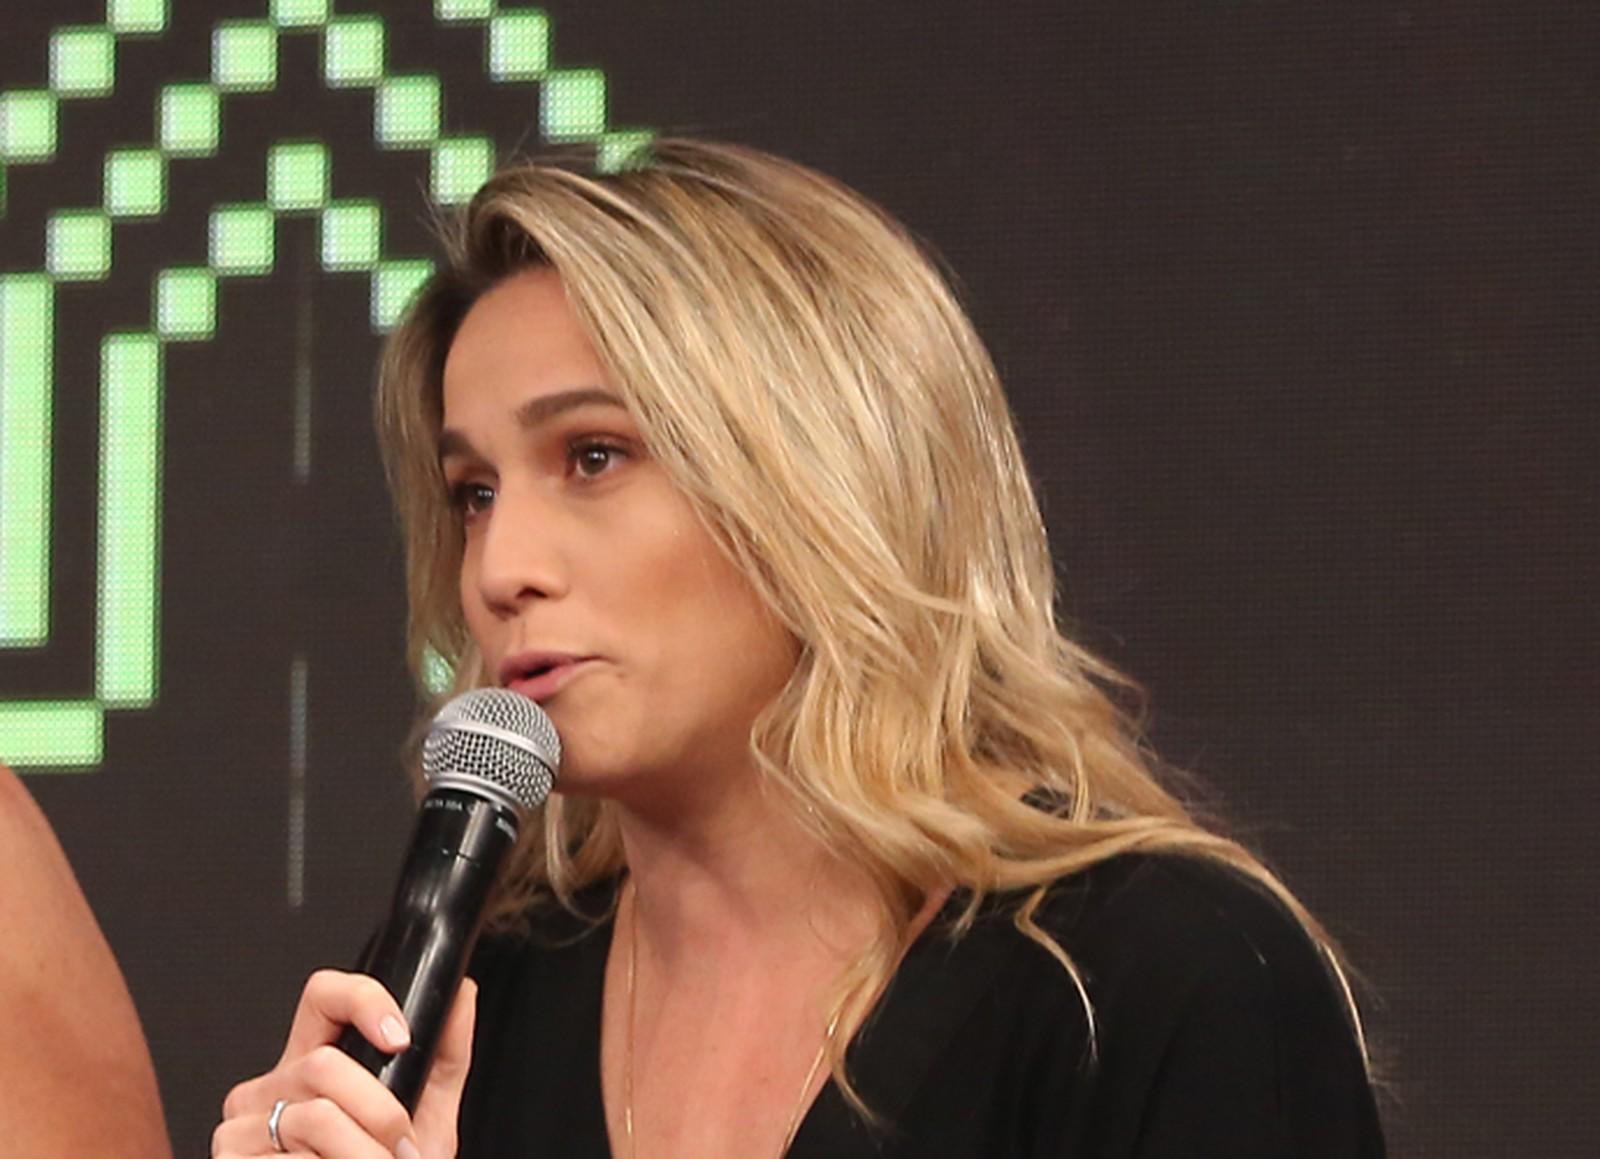 'A gente se apaixona por caráter', desabafa Fernanda Gentil sobre namoro